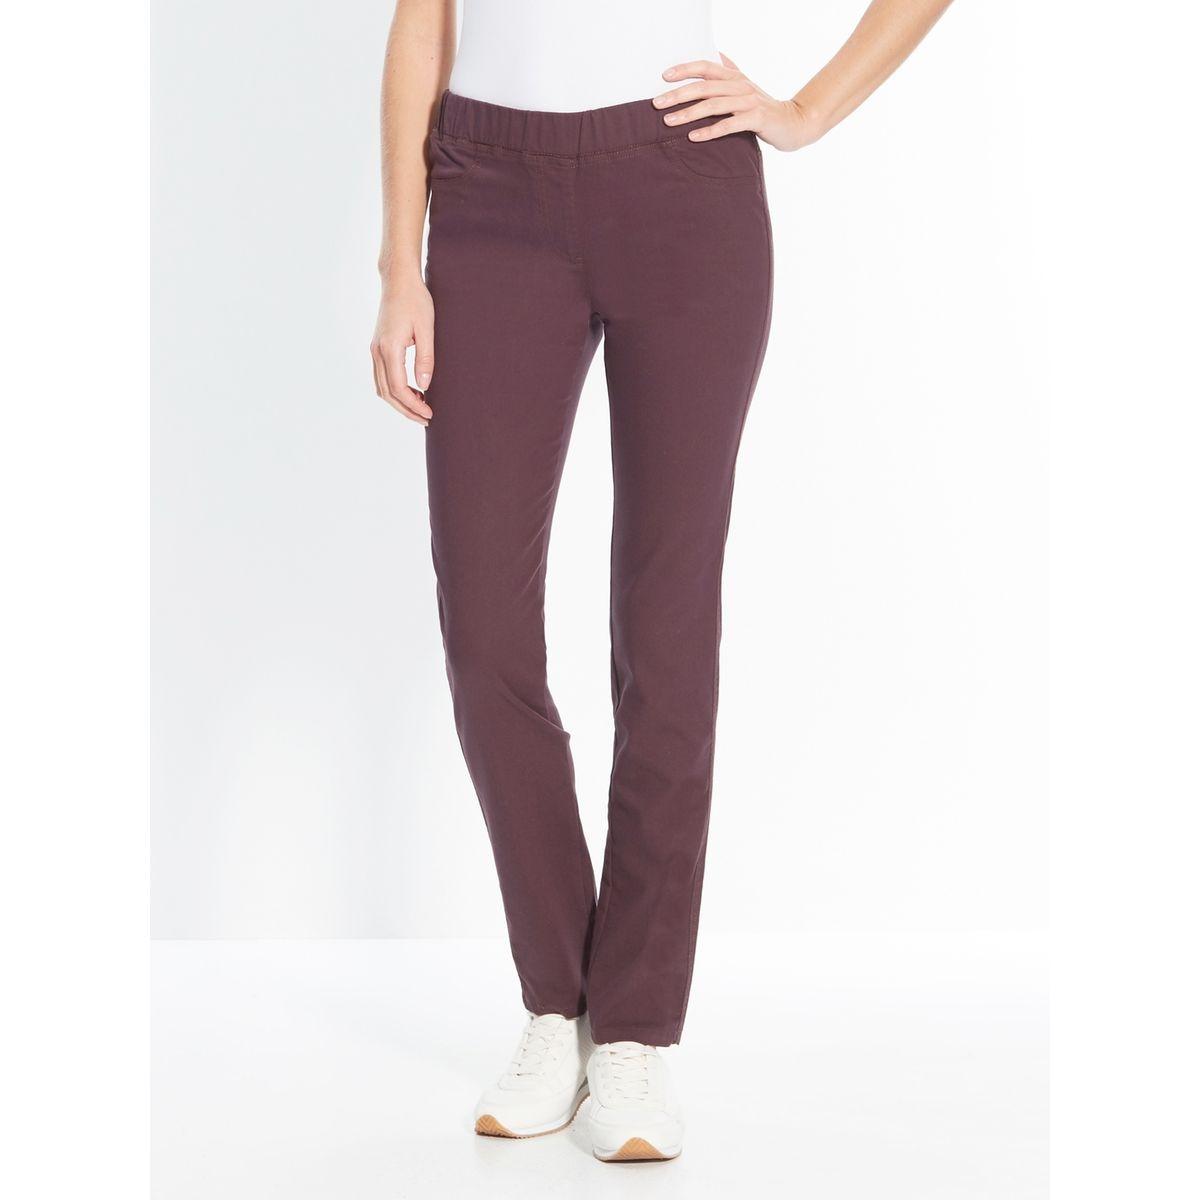 Pantalon uni extensible, mollet standard